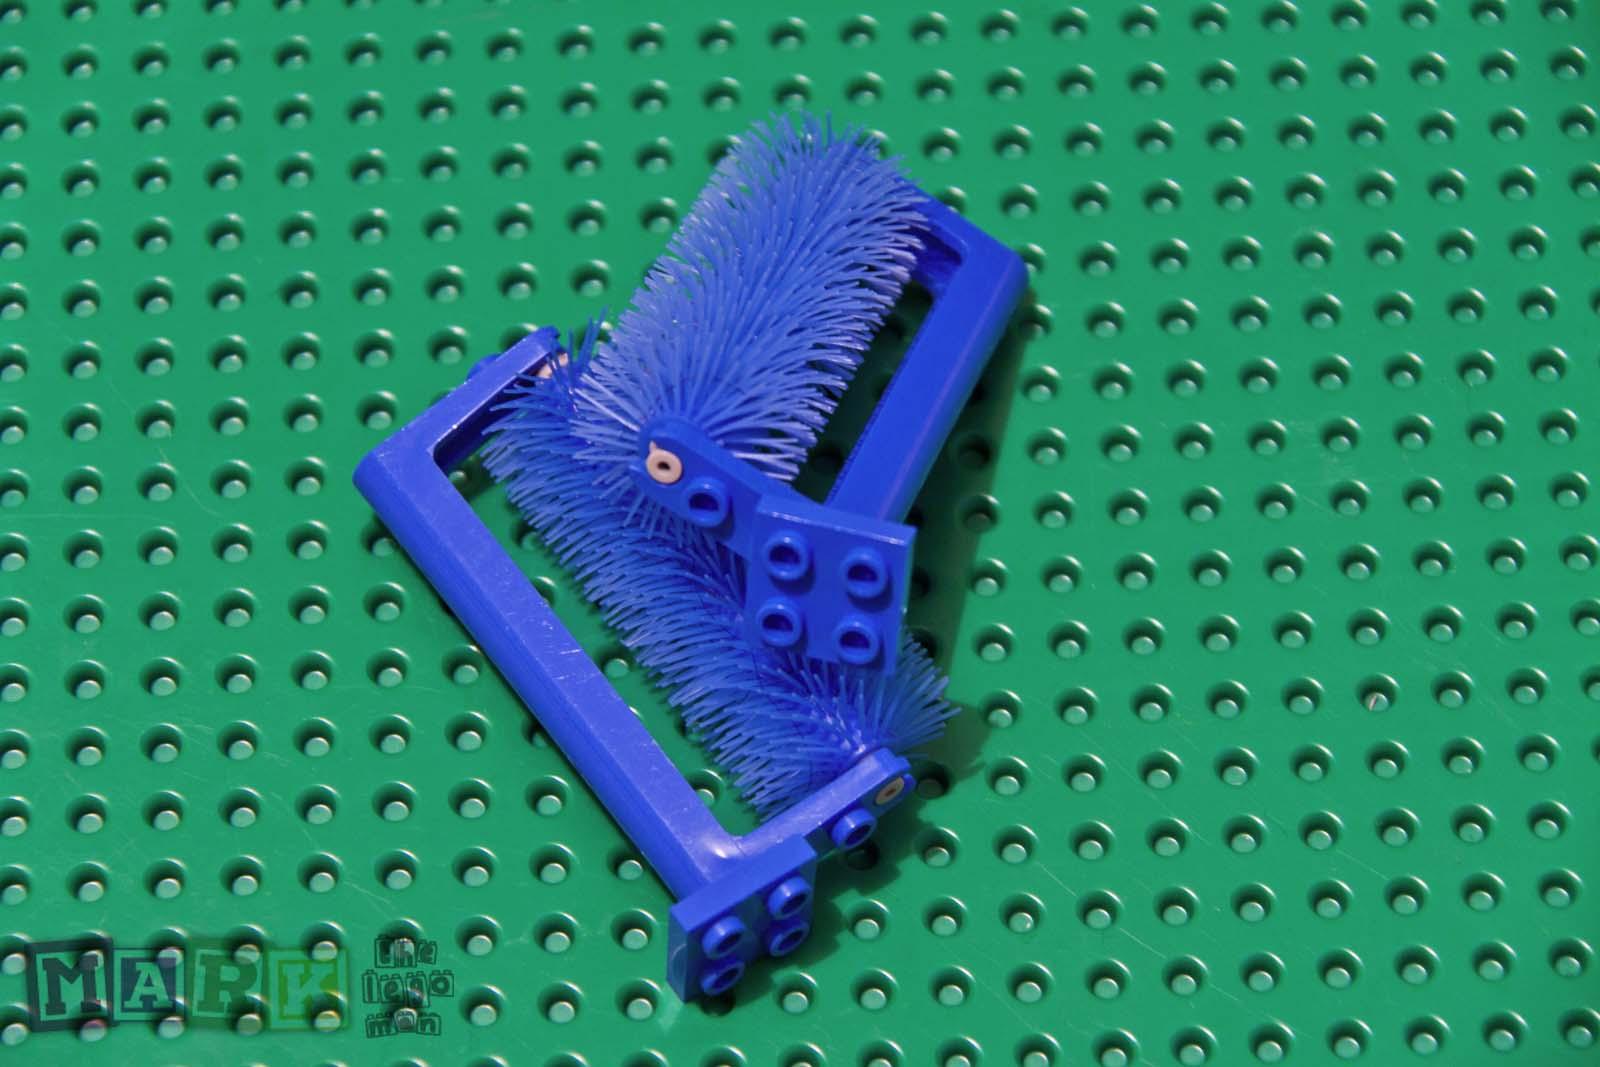 Lego Car Wash Brush